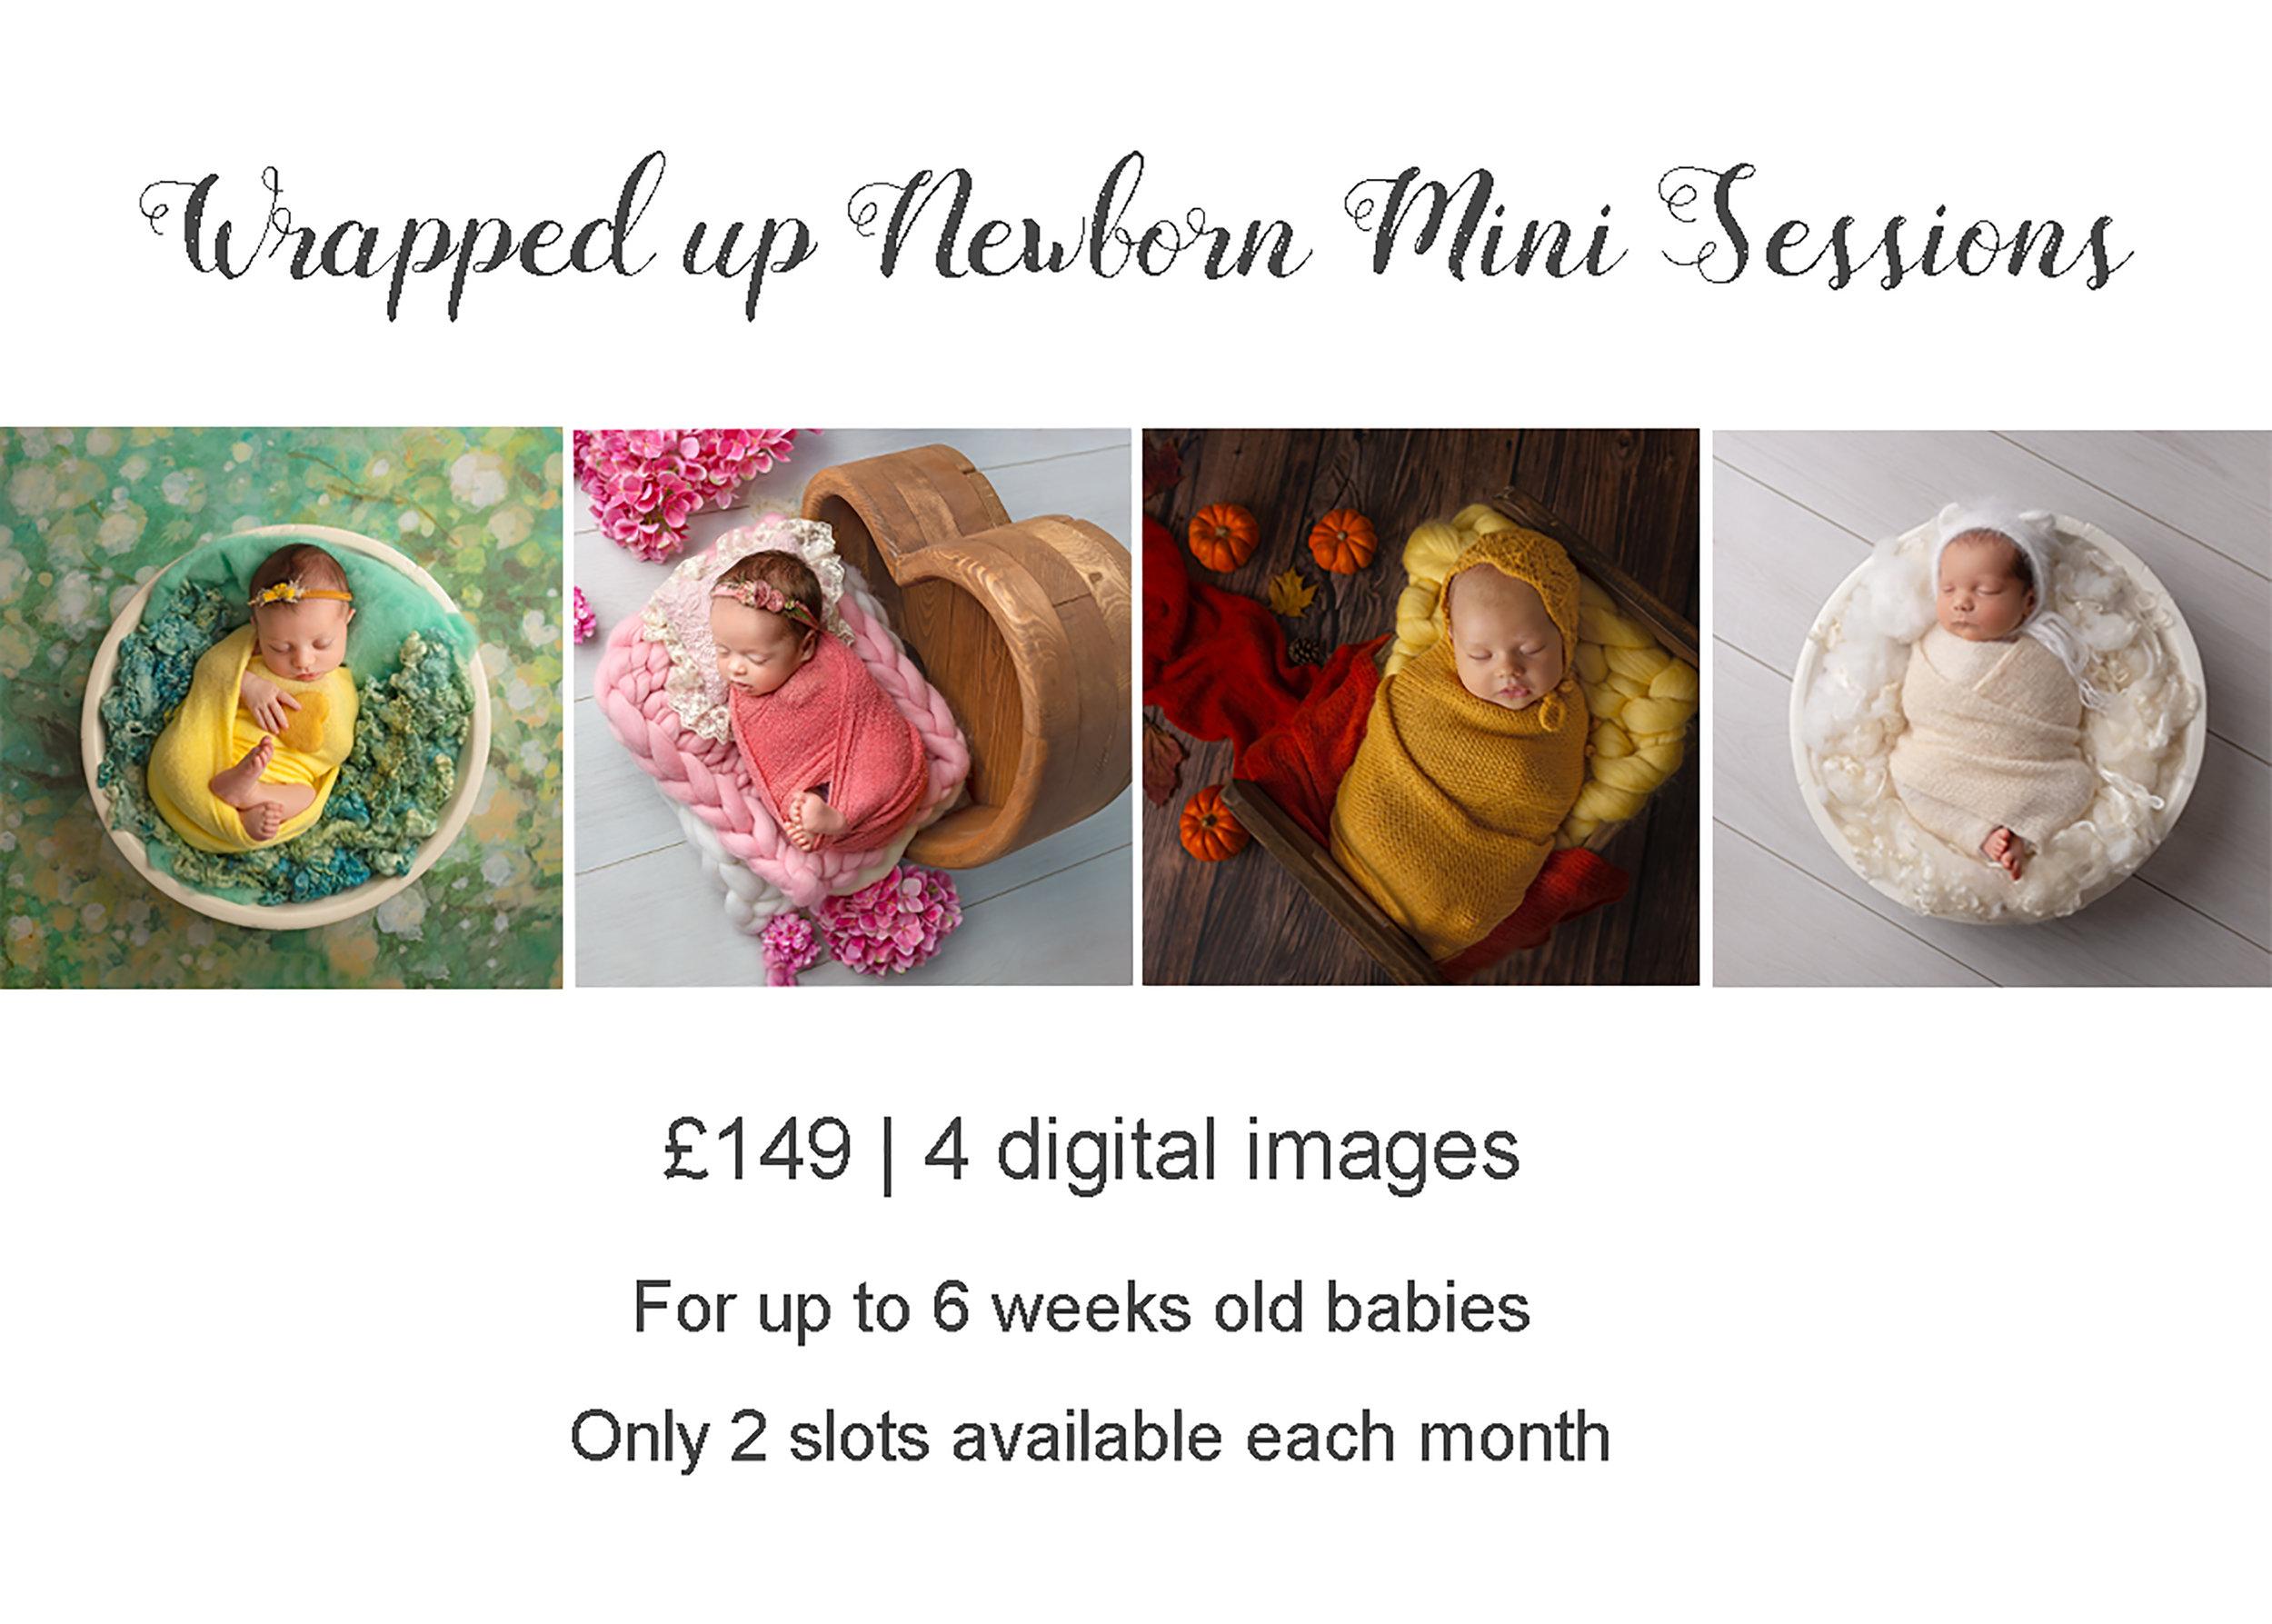 Professional newborn photography Leeds, York, Harrogate, Bradford, Wakefield: discounted Wrapped Up Newborn Mini Sessions